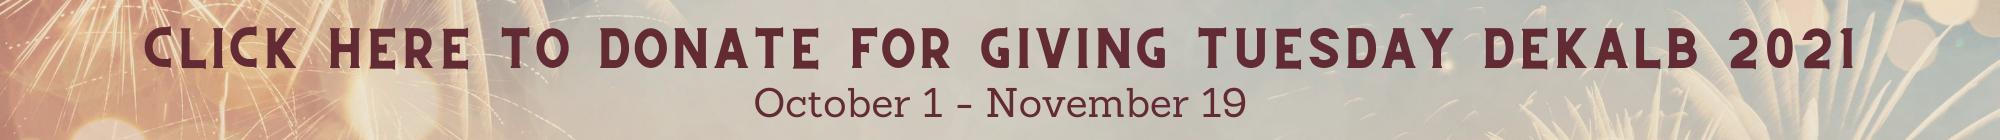 Community Foundation DeKalb County Giving Tuesday